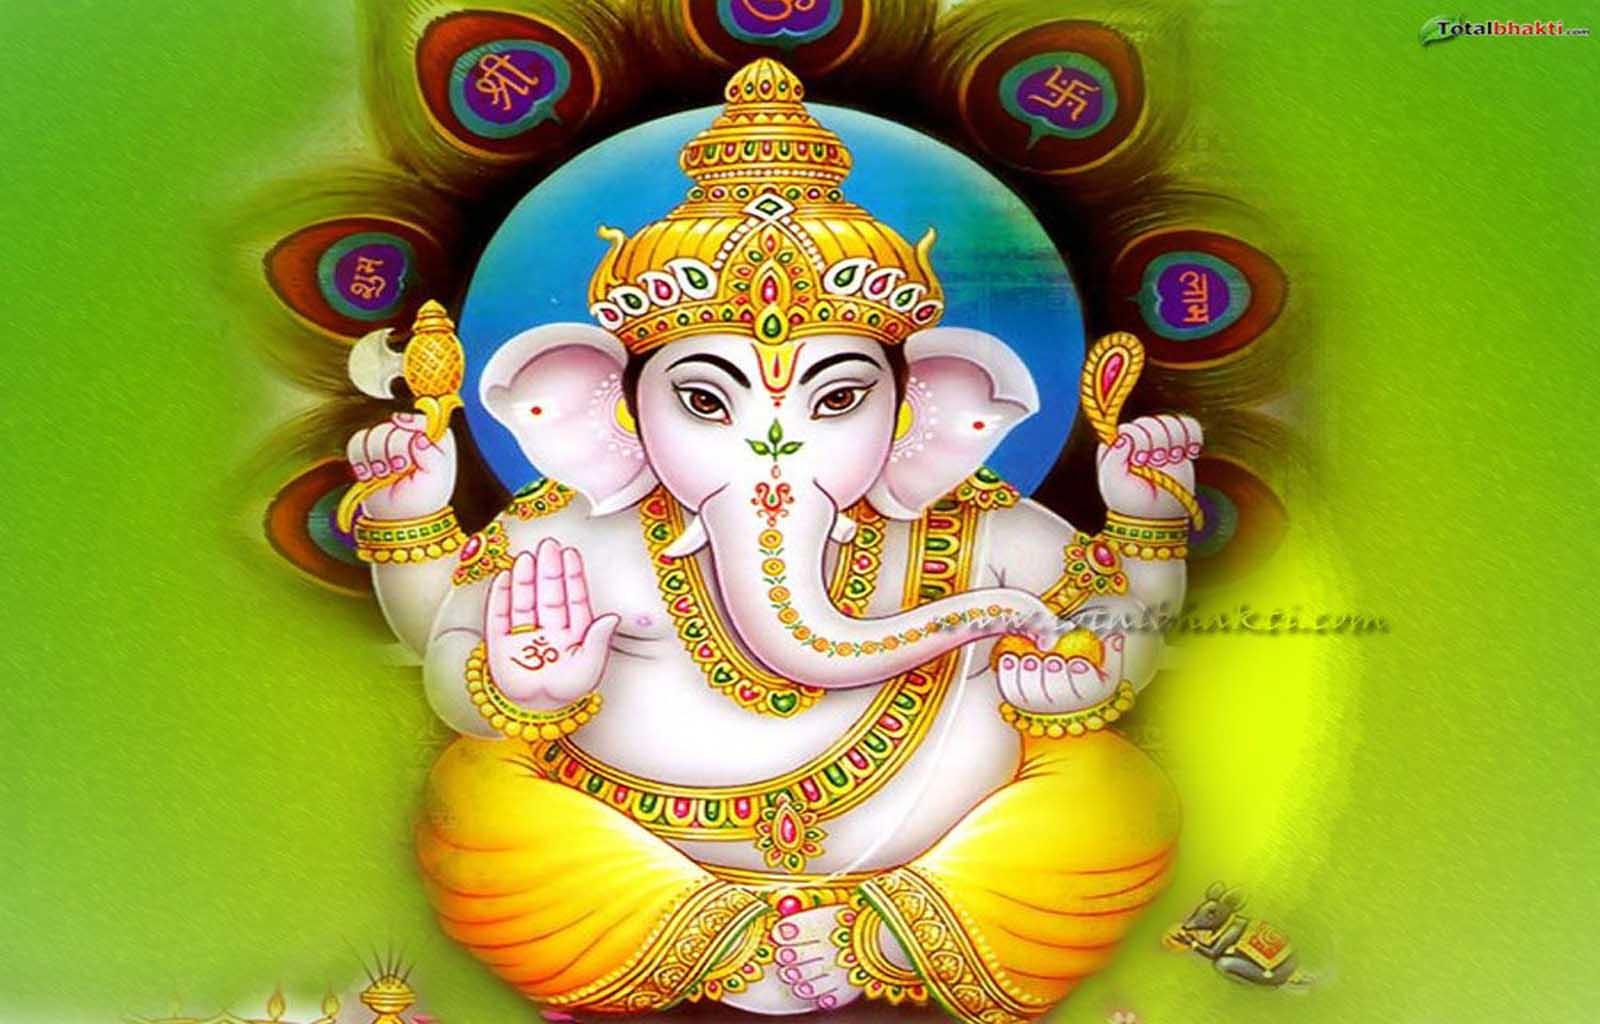 Hare krishna shri ganesh wallpaper 8 - Shri ganesh hd photo ...